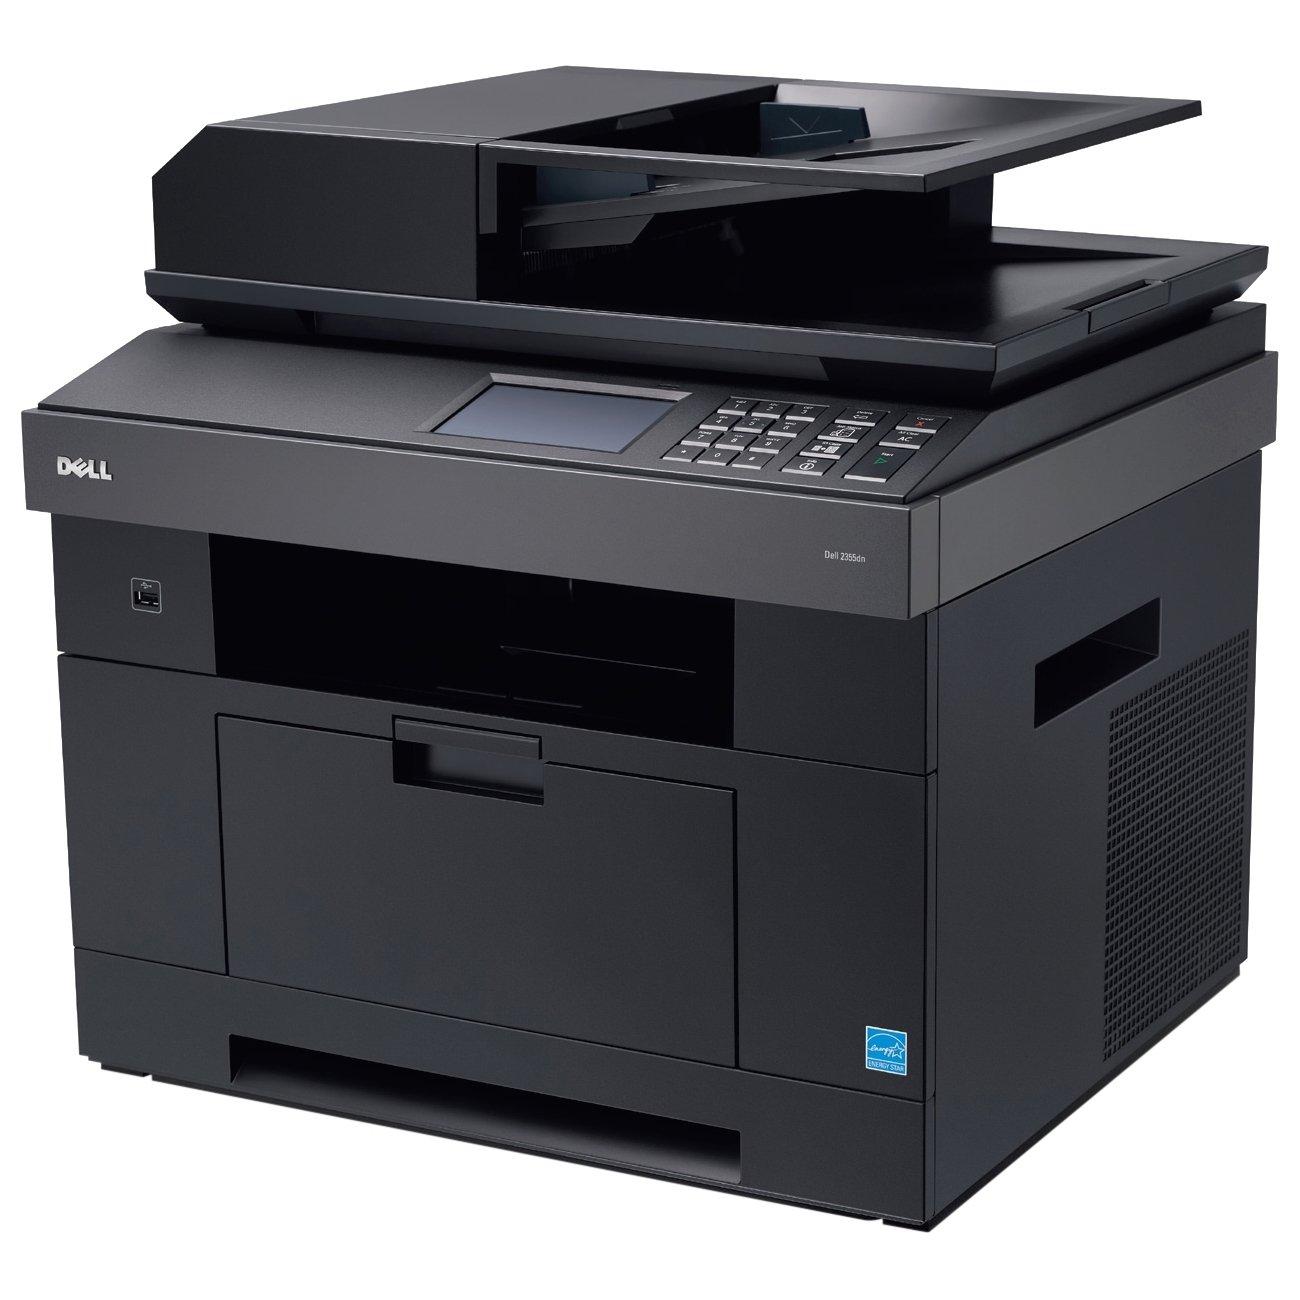 Color printing in windows 10 - Color Printing In Windows 10 55